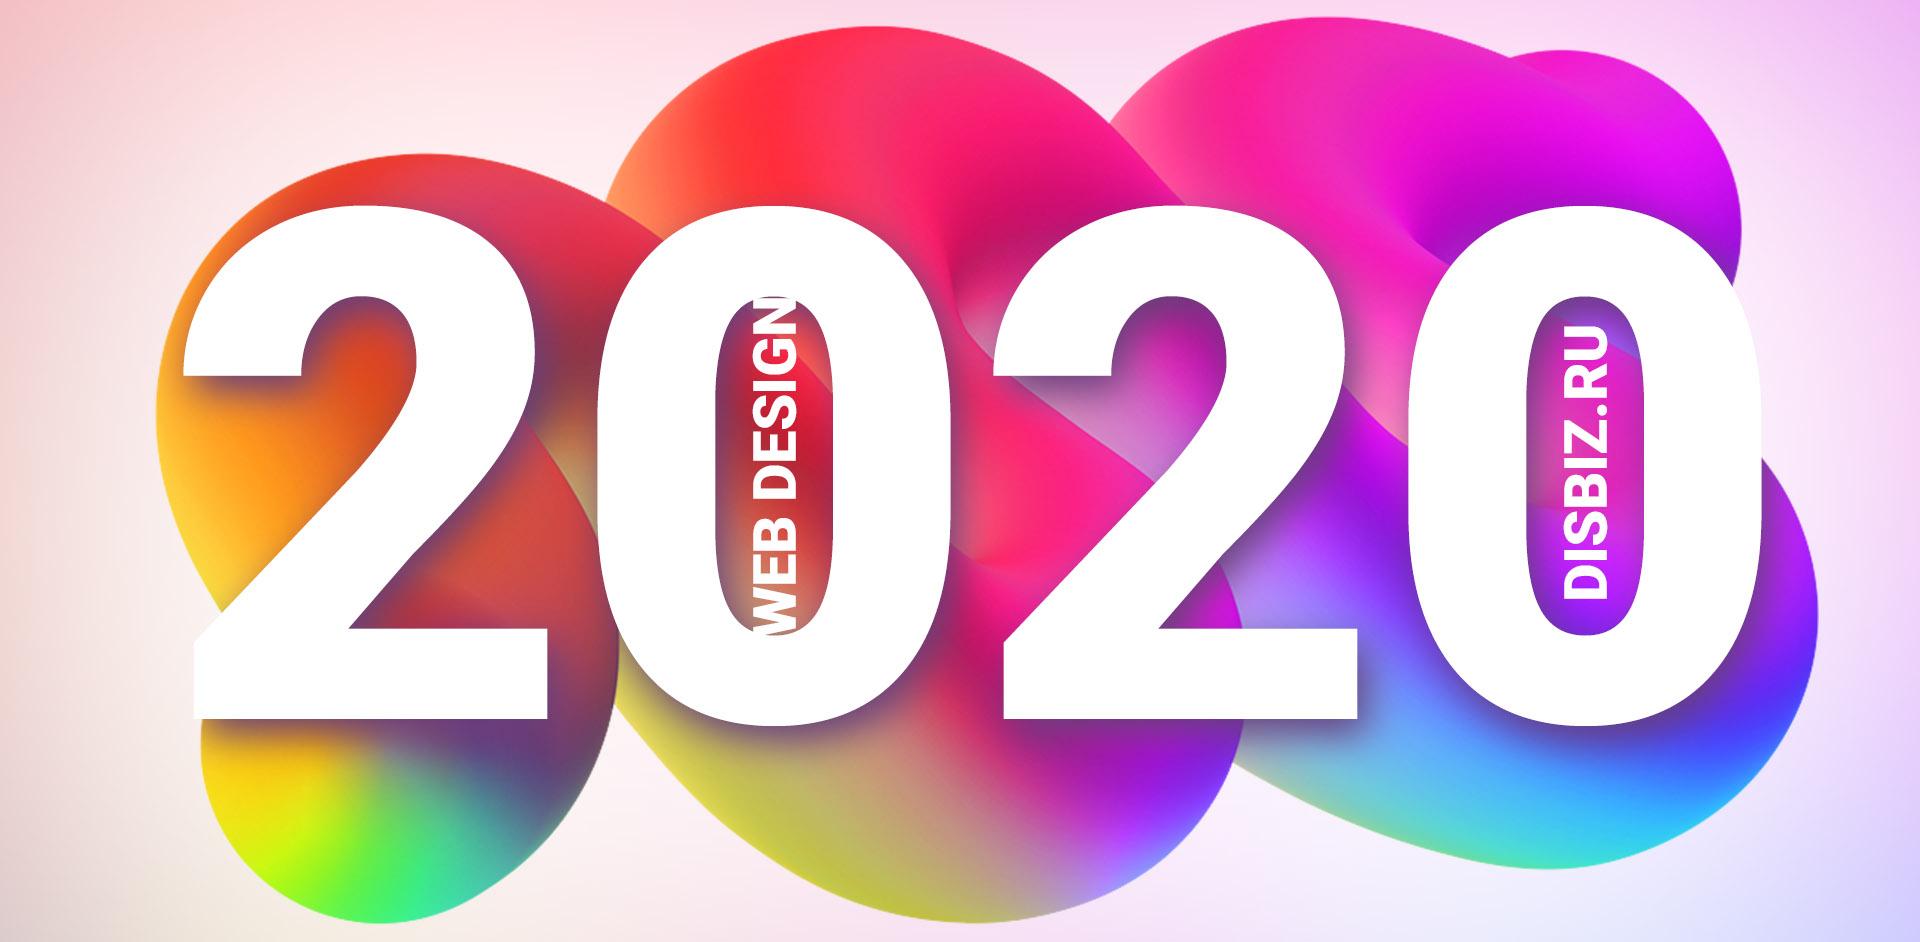 Веб-дизайн 2020 года